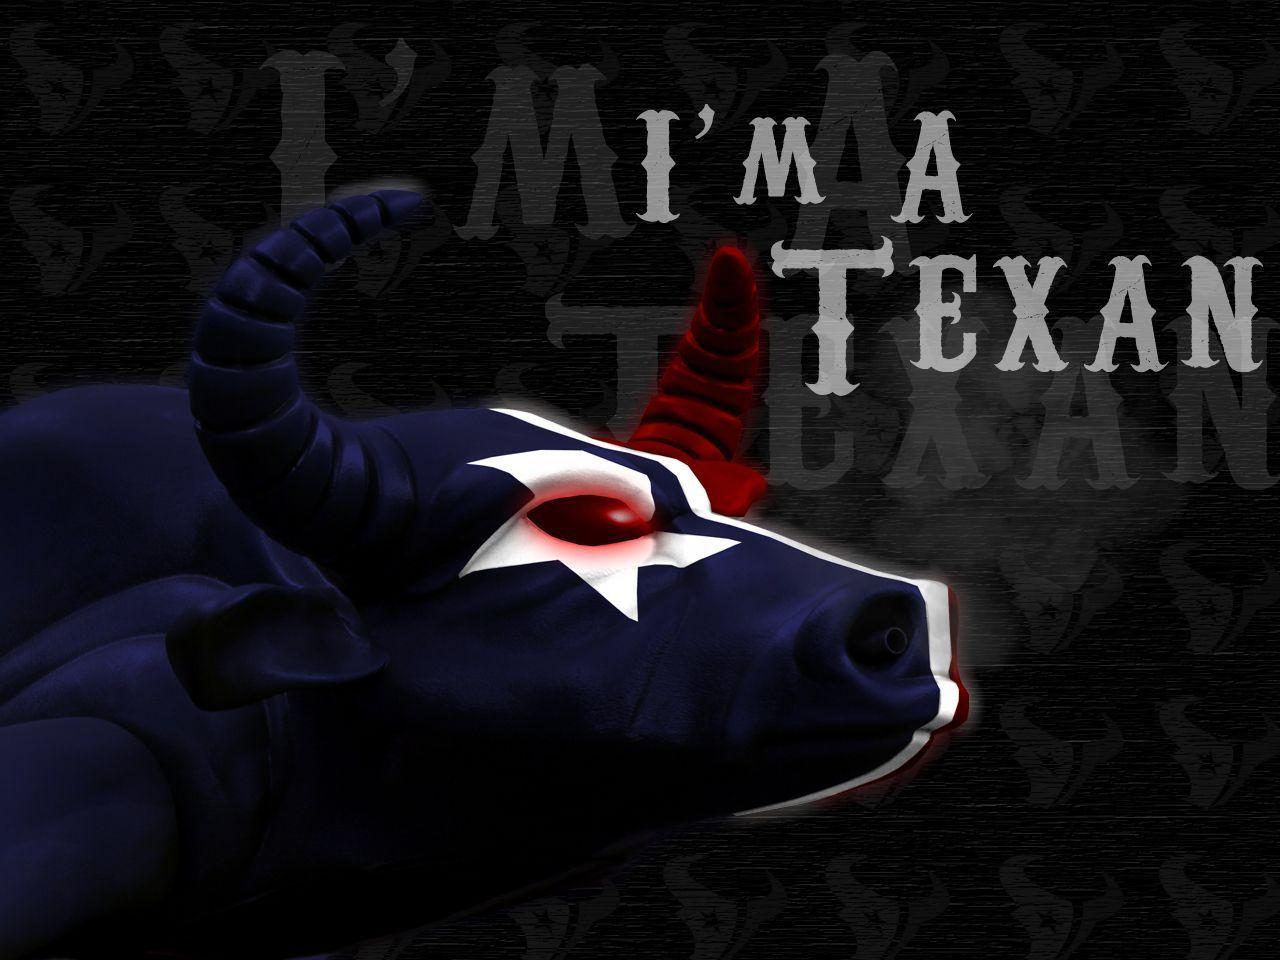 Houston Texans Wallpapers 2015